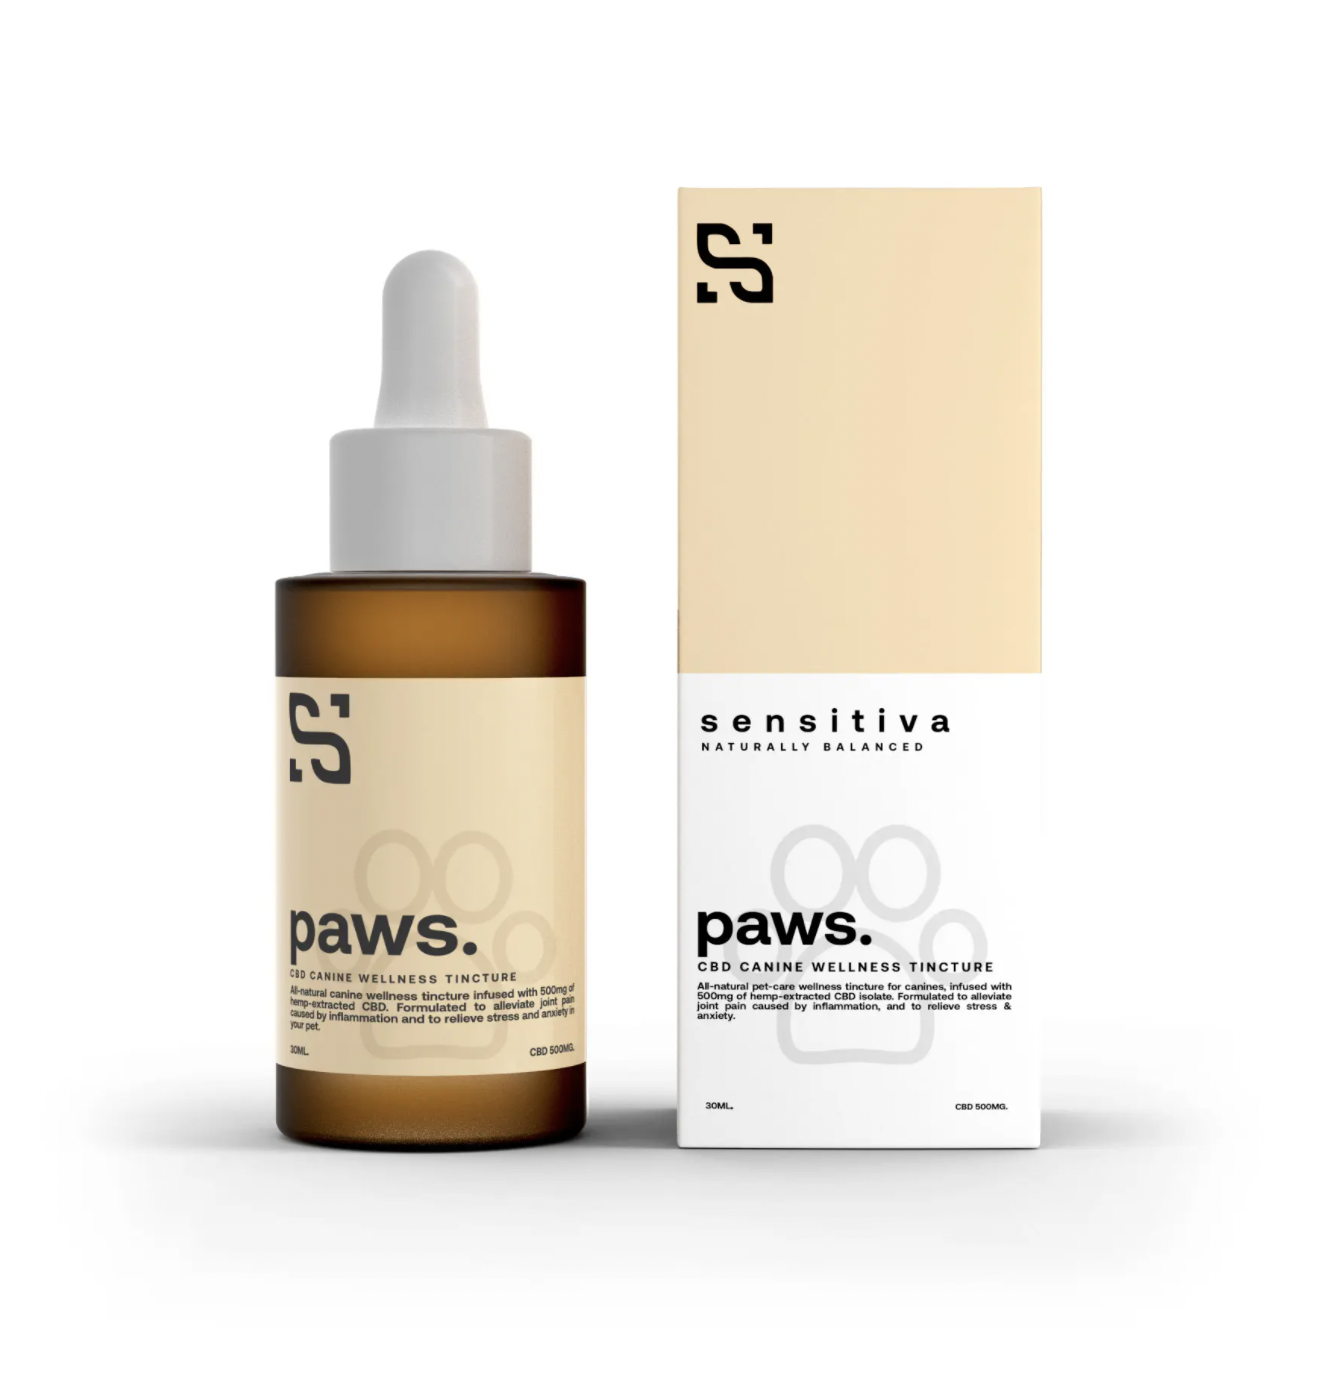 Sensitiva Canine Tincture 500 mg